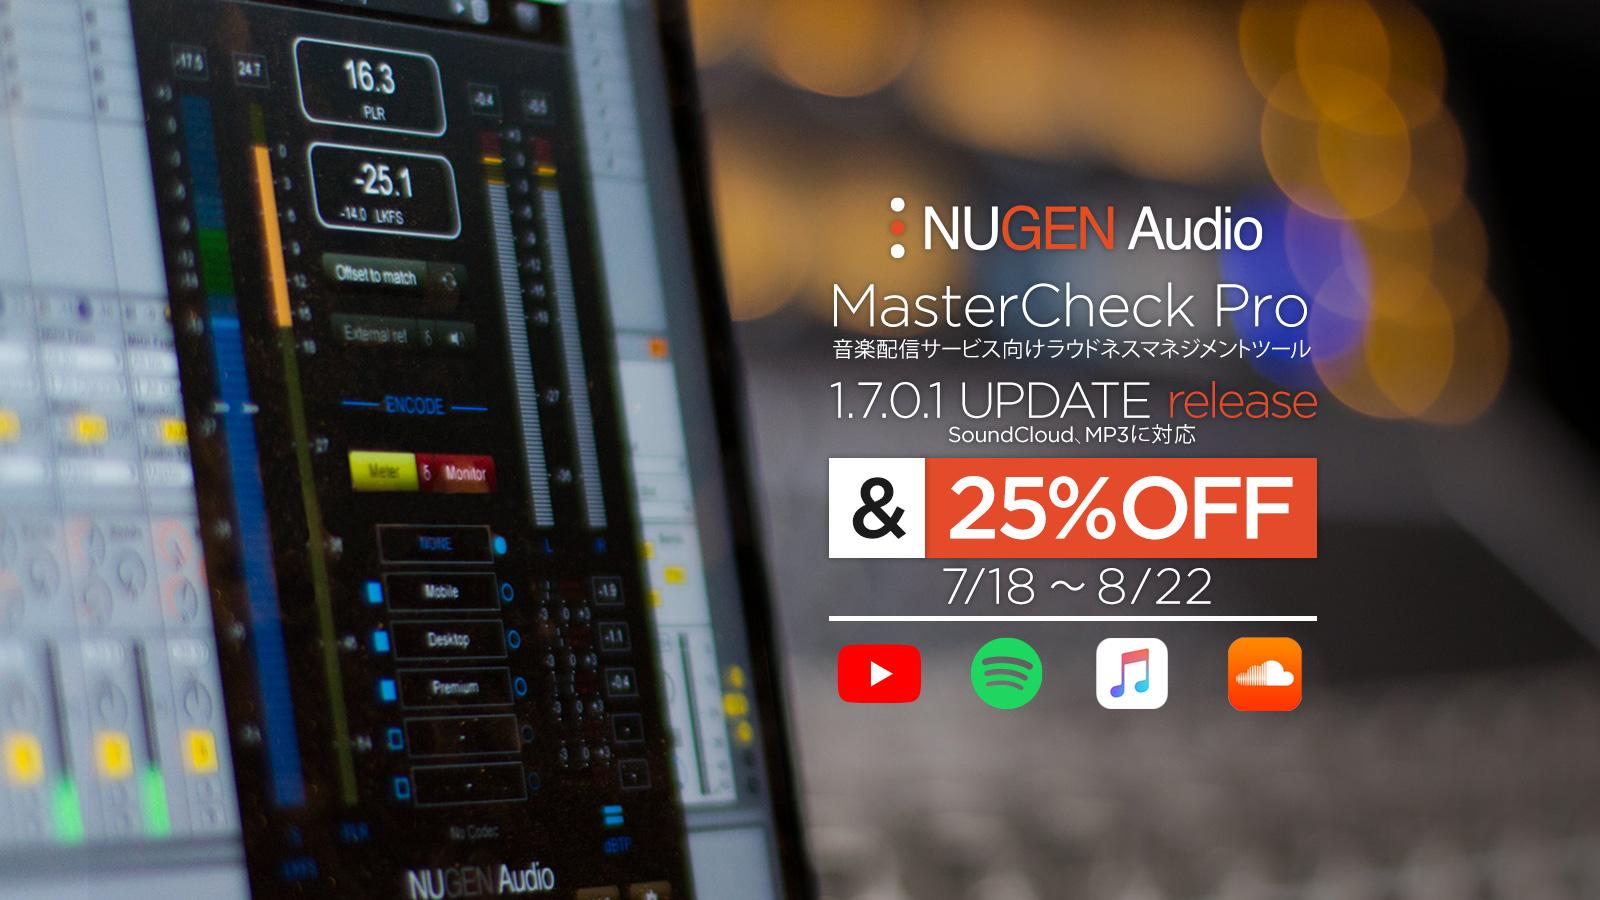 Nugen Audio Master Check Pro 1.7.0.1リリース & 25% OFF プロモーション